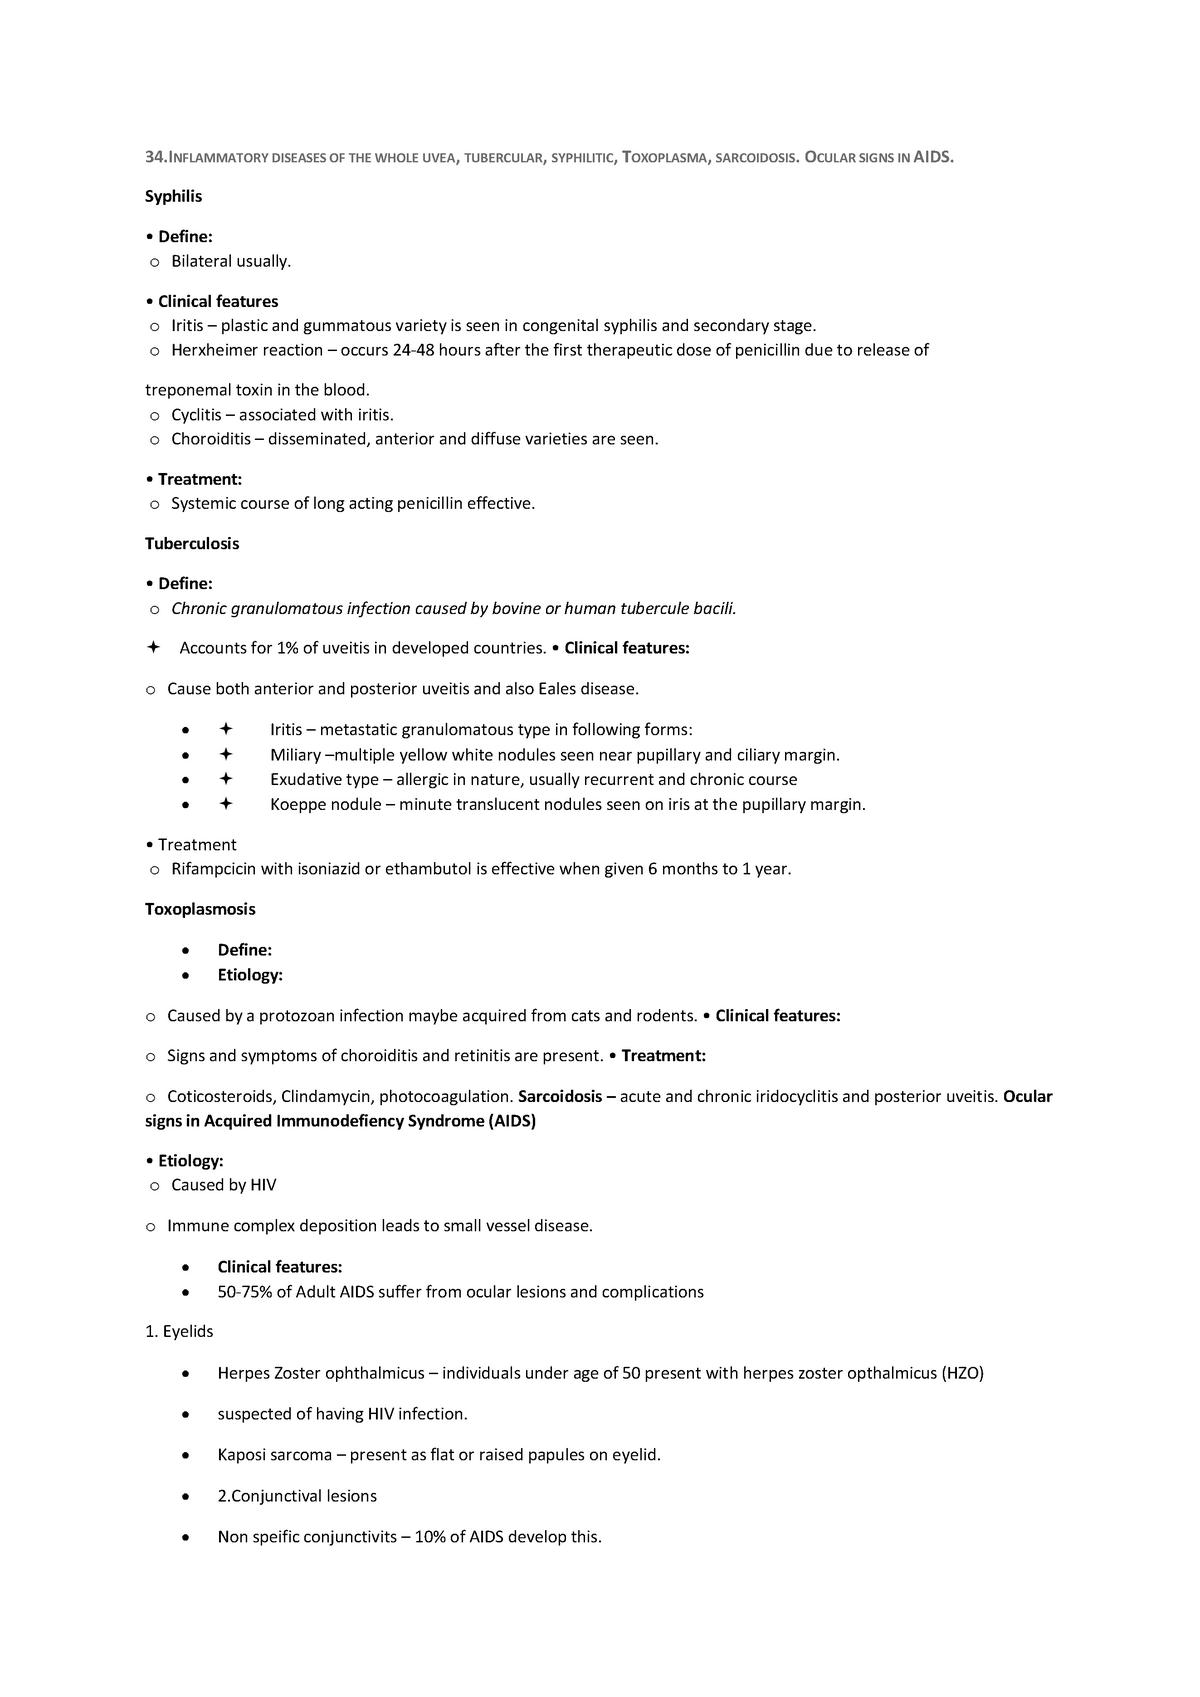 Opthamology essay 34 - Grade: 5 - medicine: Ophthalmology - StuDocu